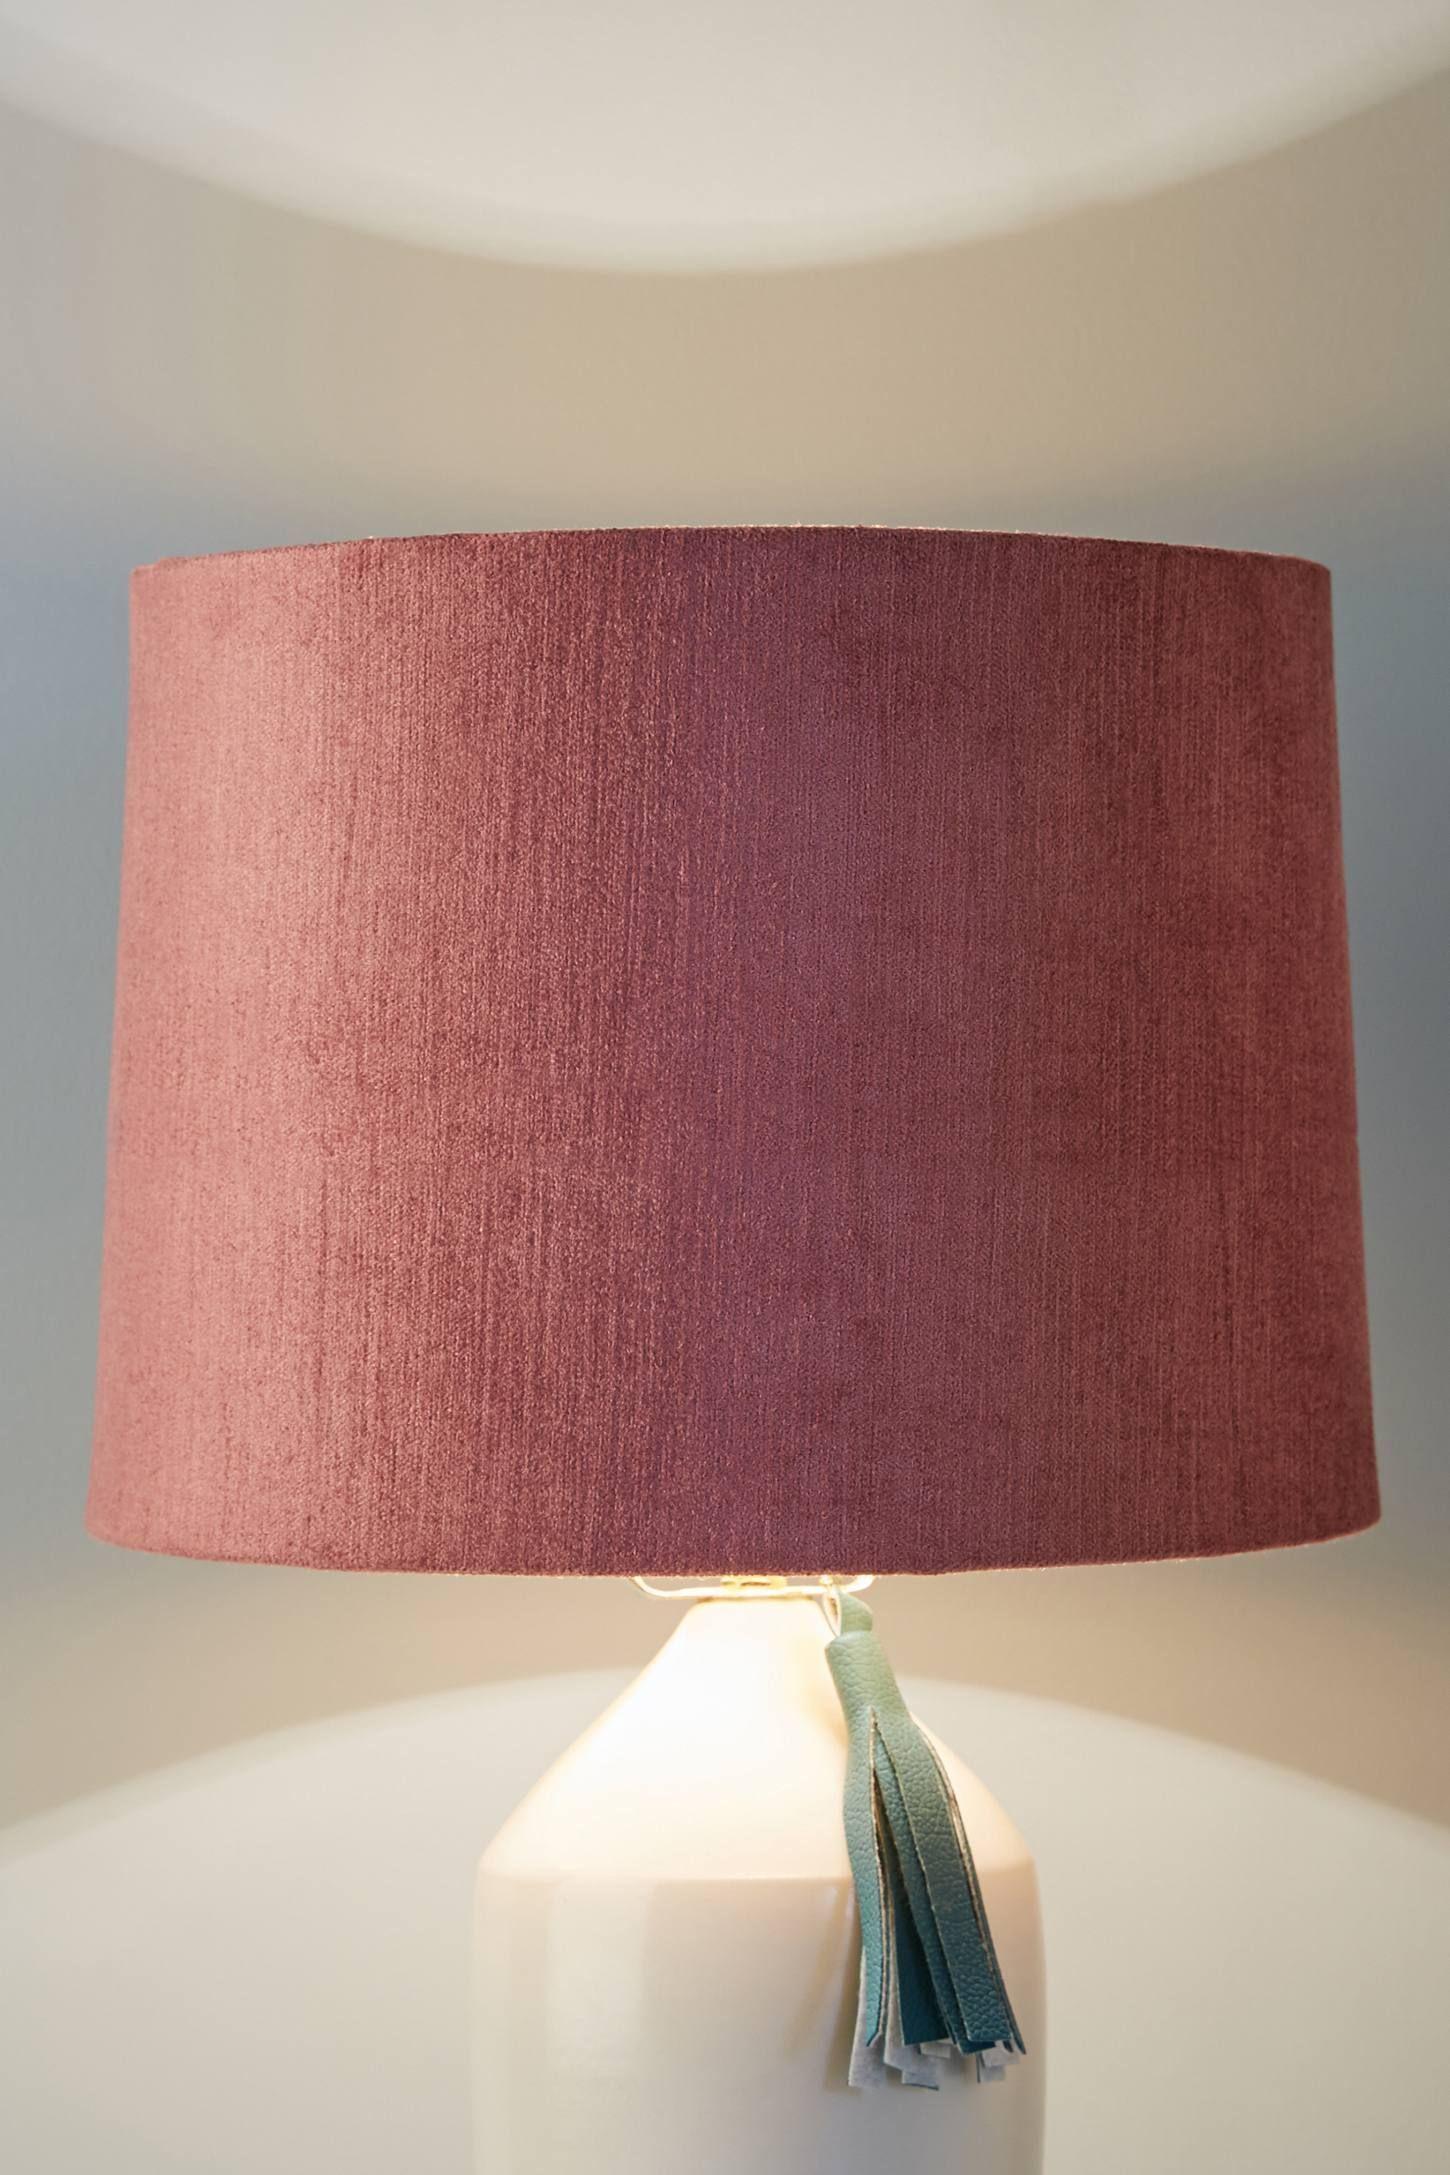 Solid Velvet Lamp Shade Lamp Shade Lamp Contemporary Lamp Shades